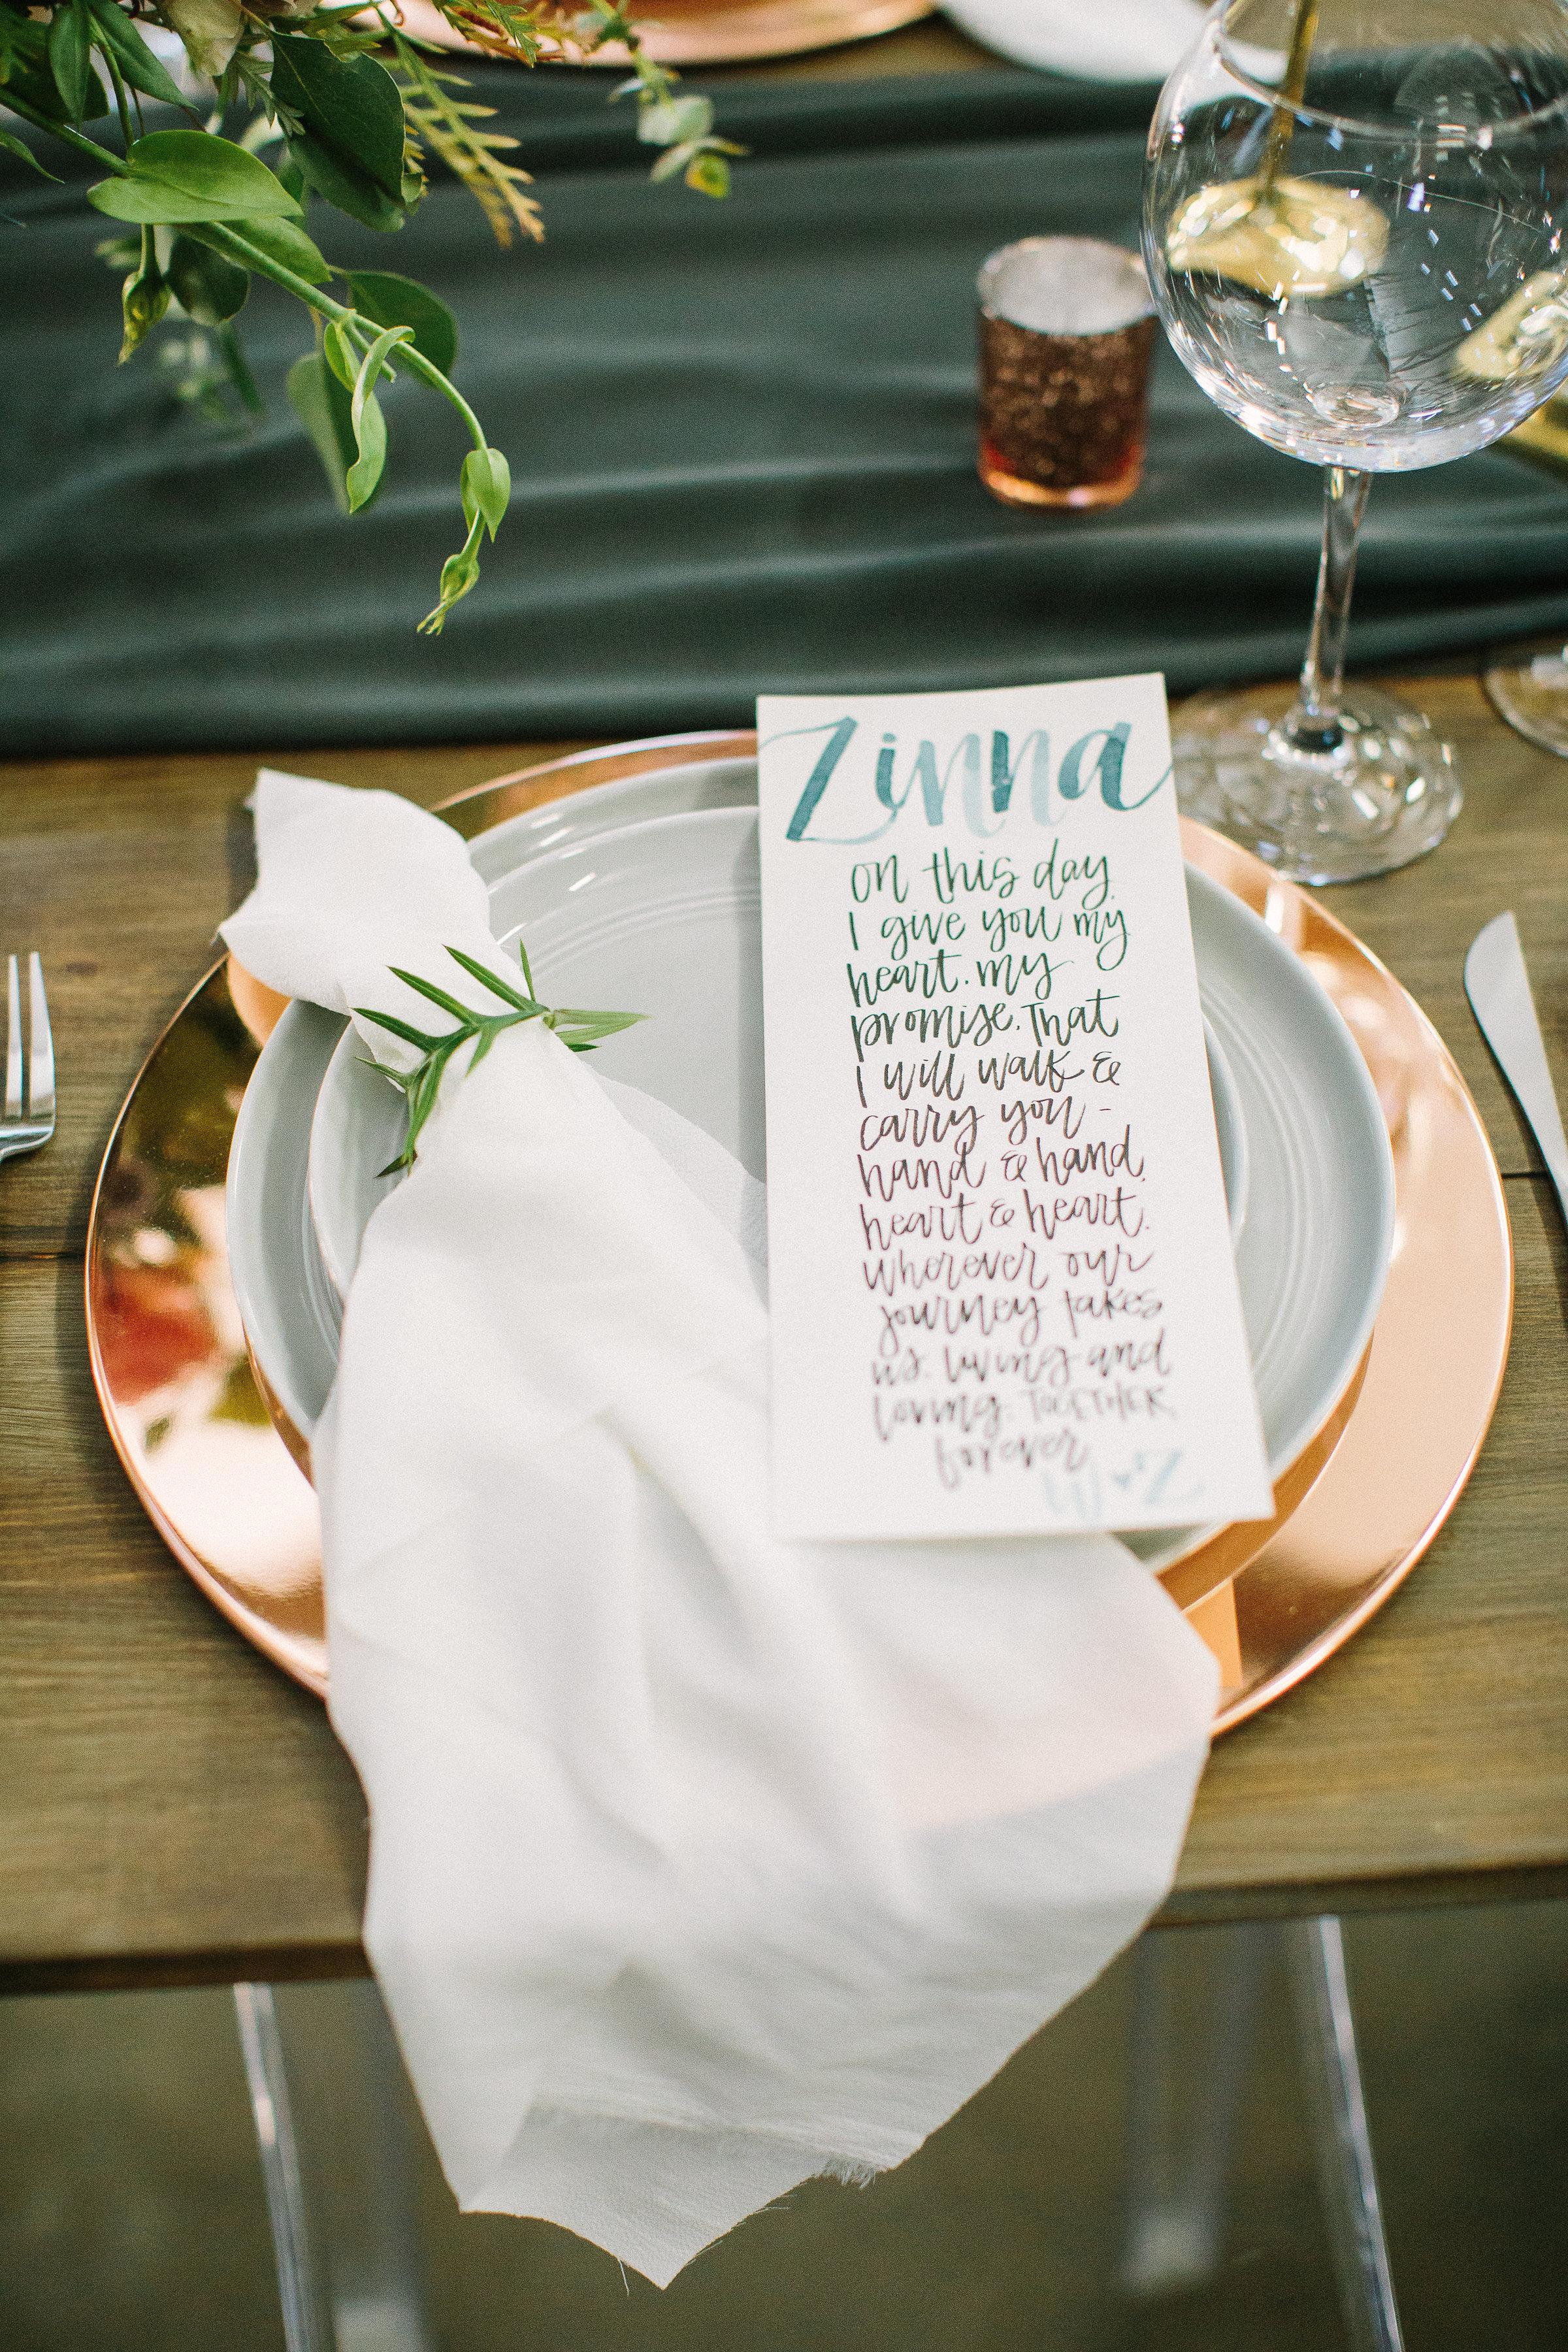 Ellen-Ashton-Photography-Peach-Creek-Ranch-Weddings-Wed-and-Prosper90